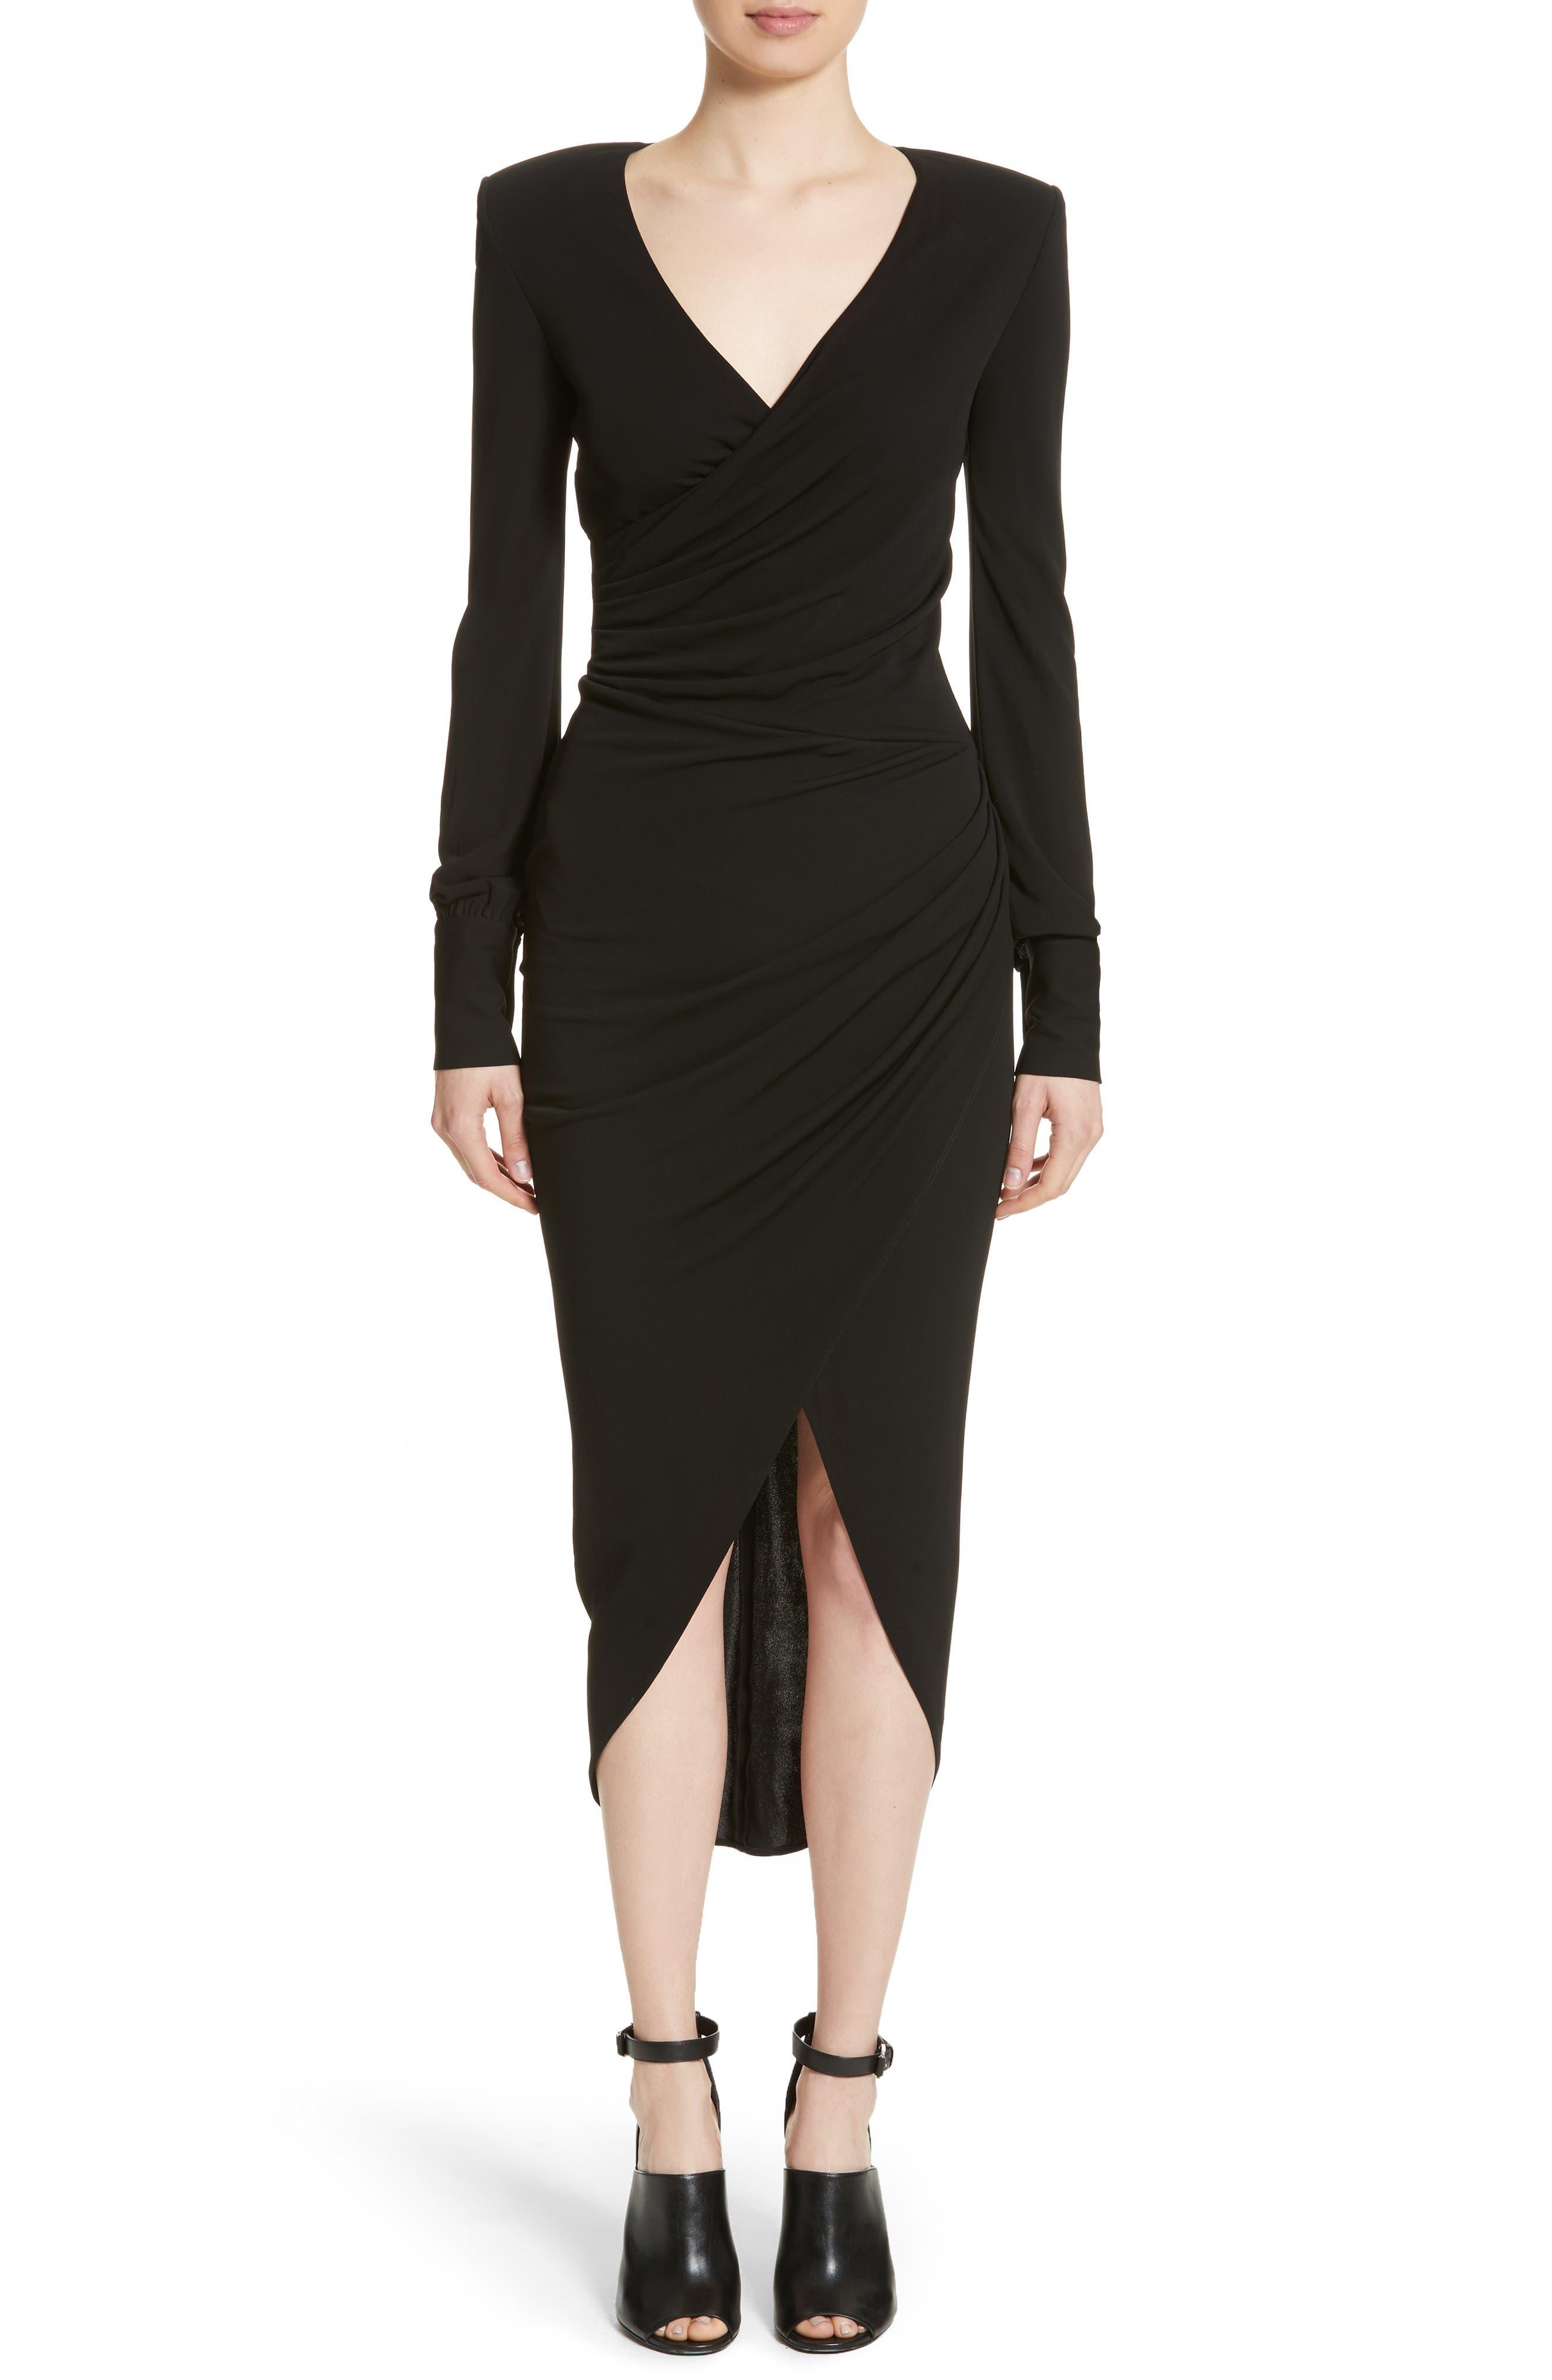 Michael Kors Stretch Jersey Wrap Dress, Black